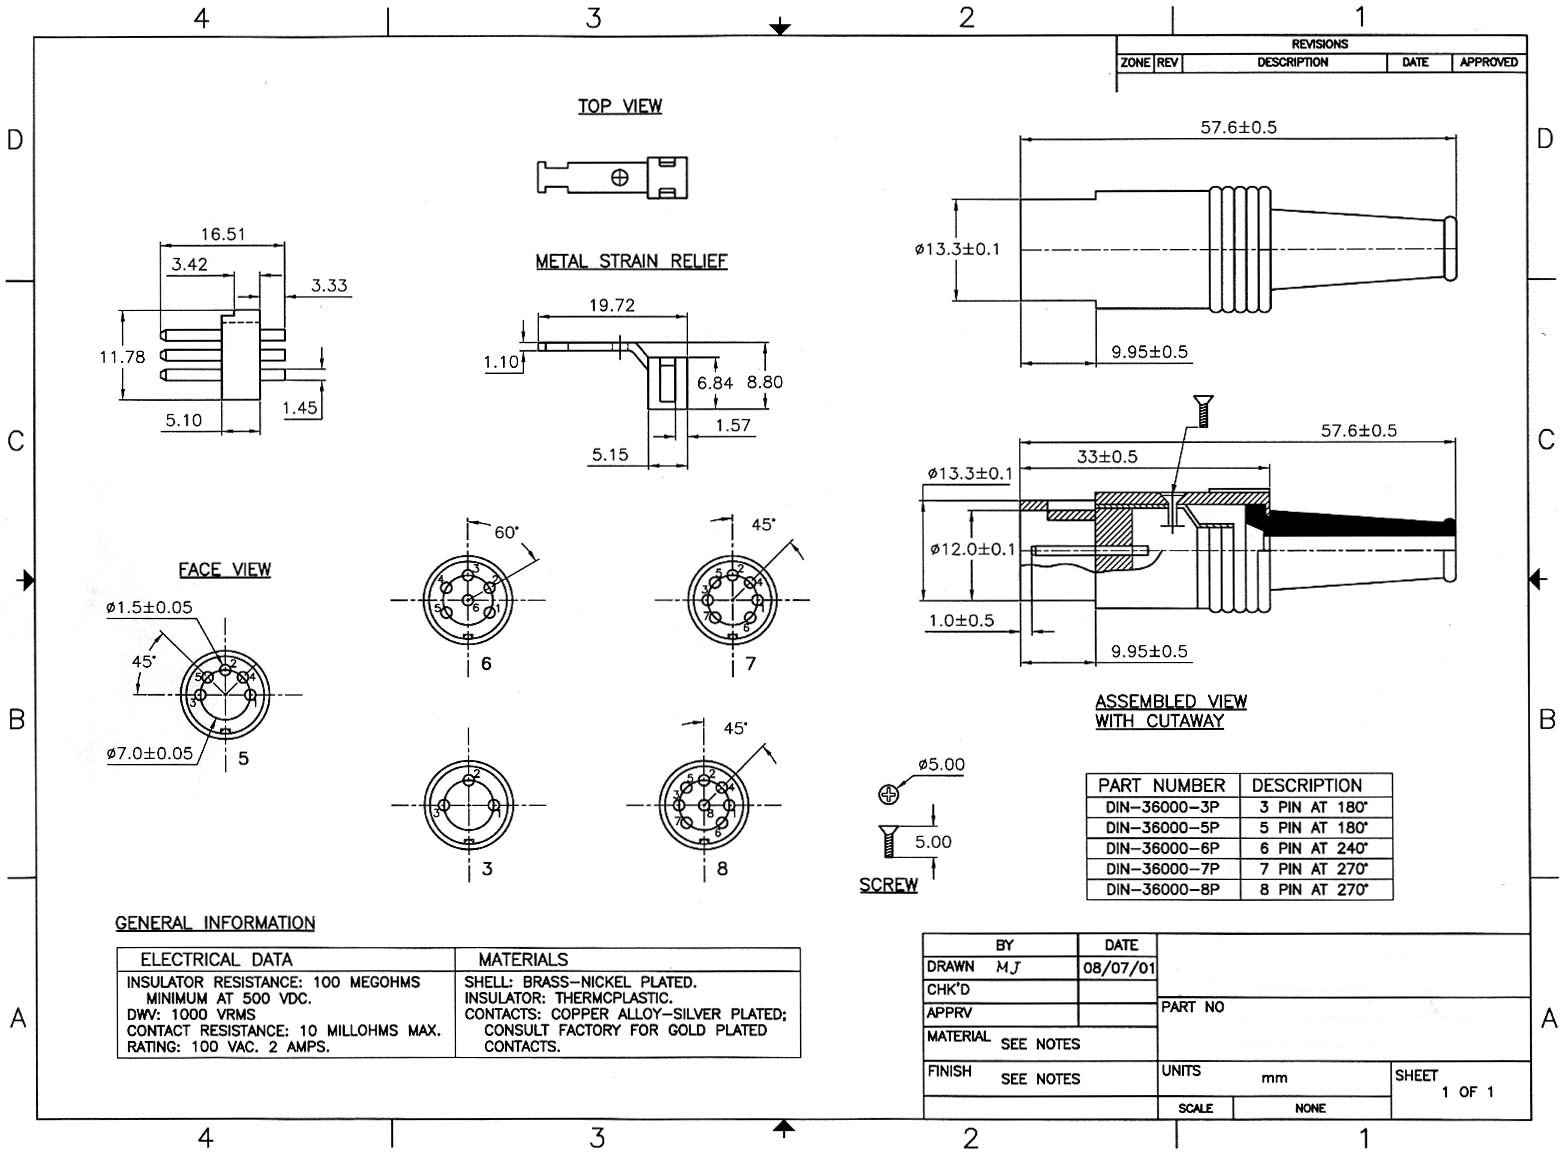 5 pin din to rca plug wiring diagram rj11 xlr quotes flagstaff